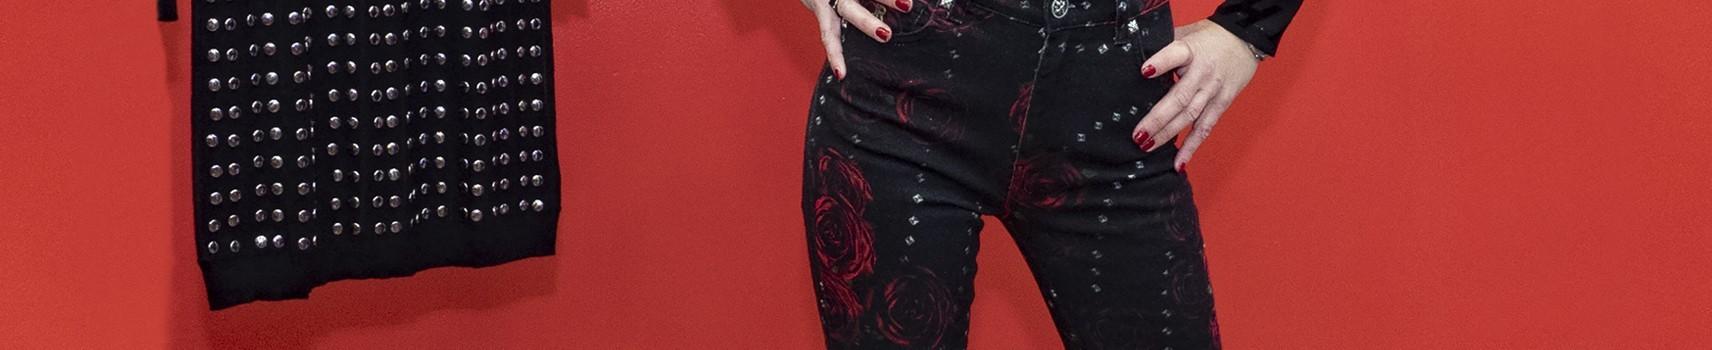 NEW Women's Jeans Collection | AGEMINA Boutique